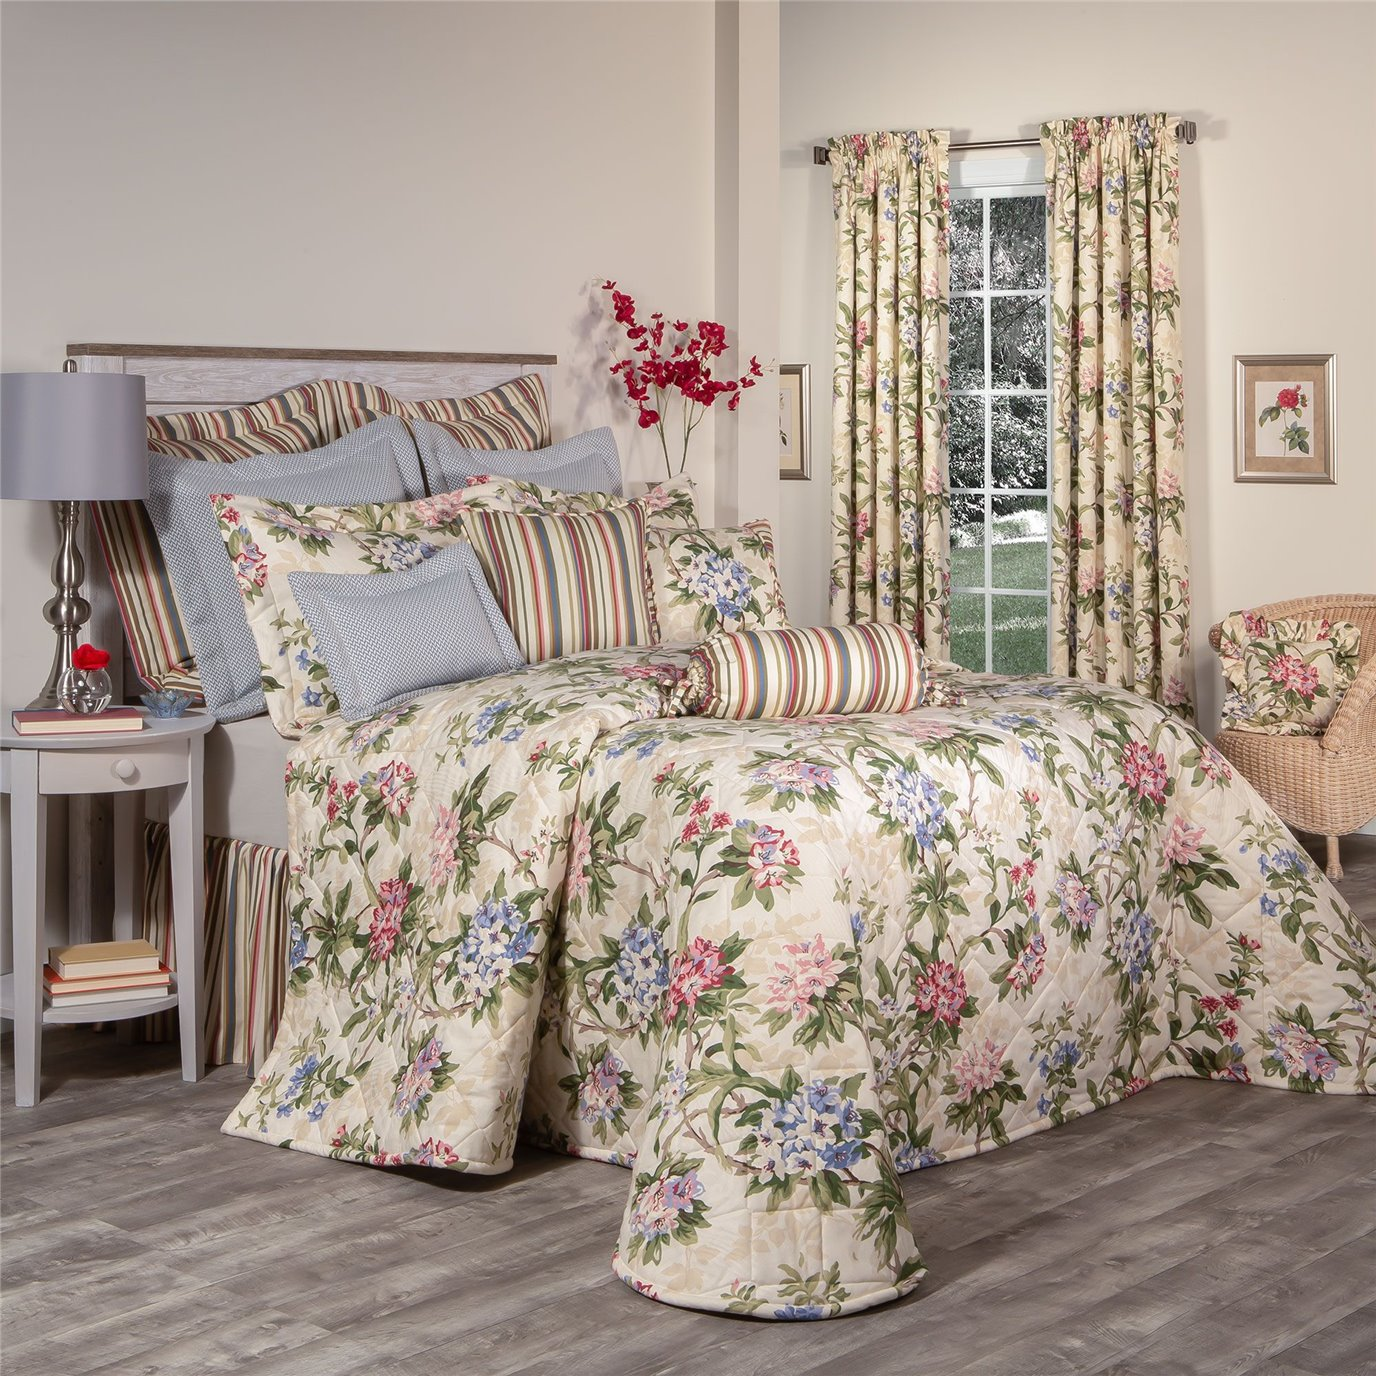 Hillhouse Full  Bedspread